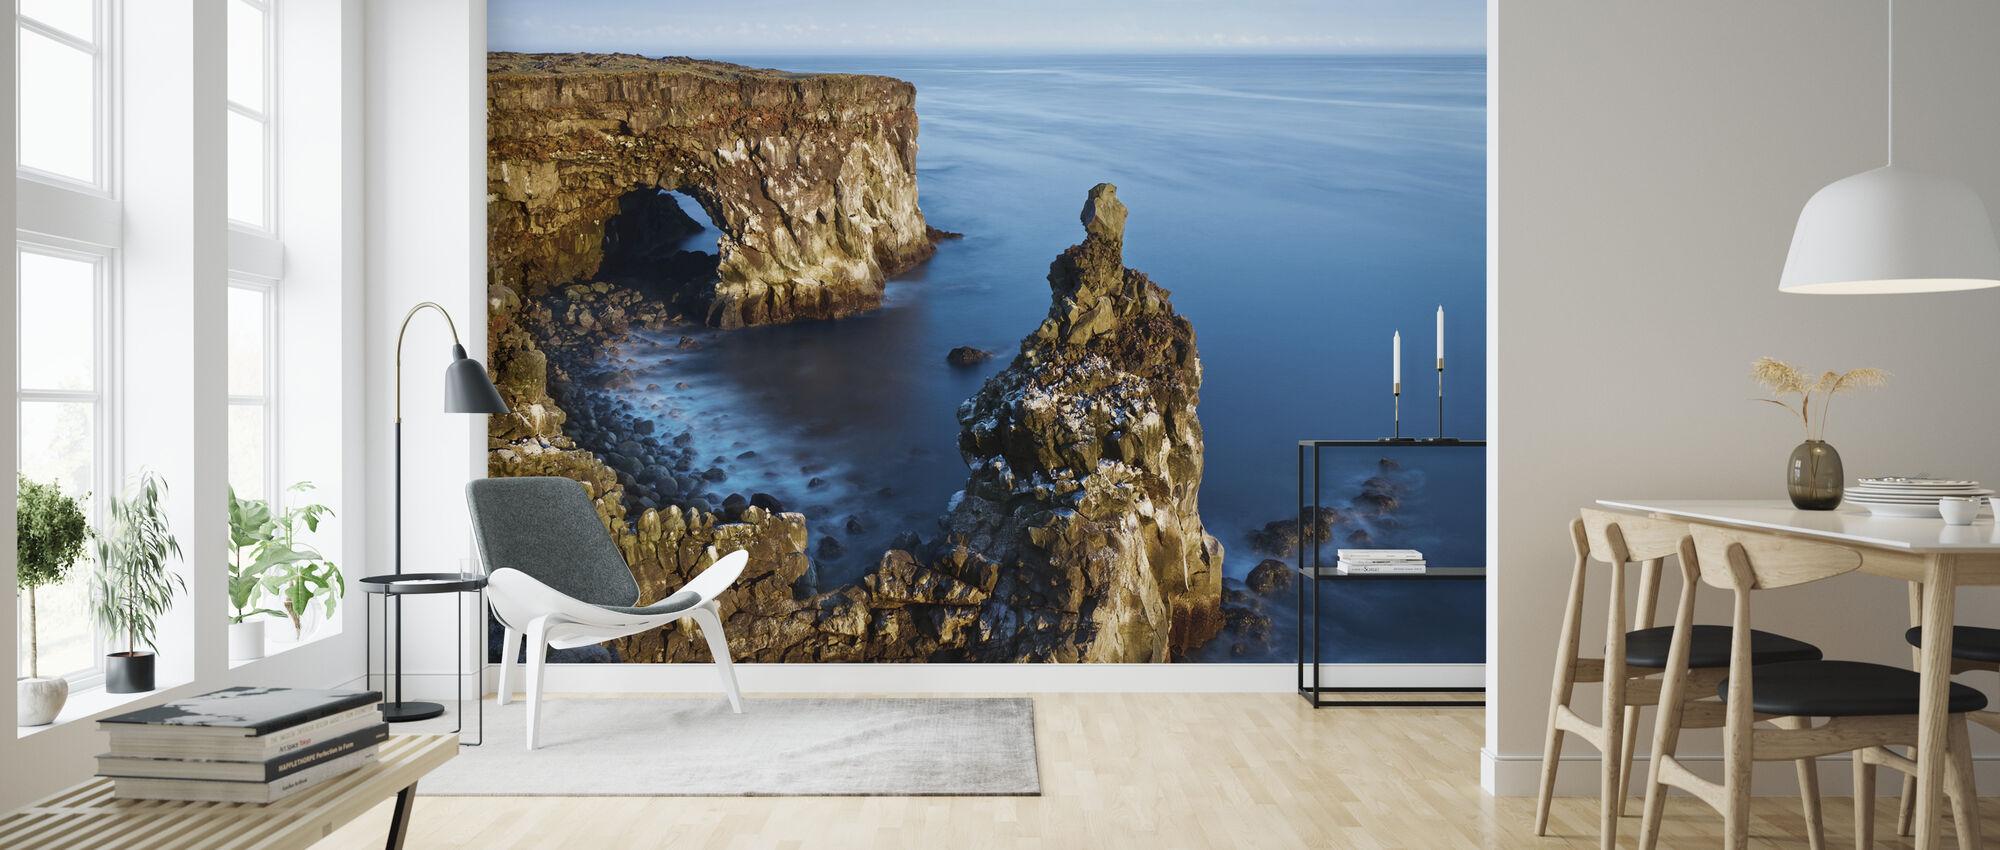 Svortuloft Cliffs - Islanti - Tapetti - Olohuone